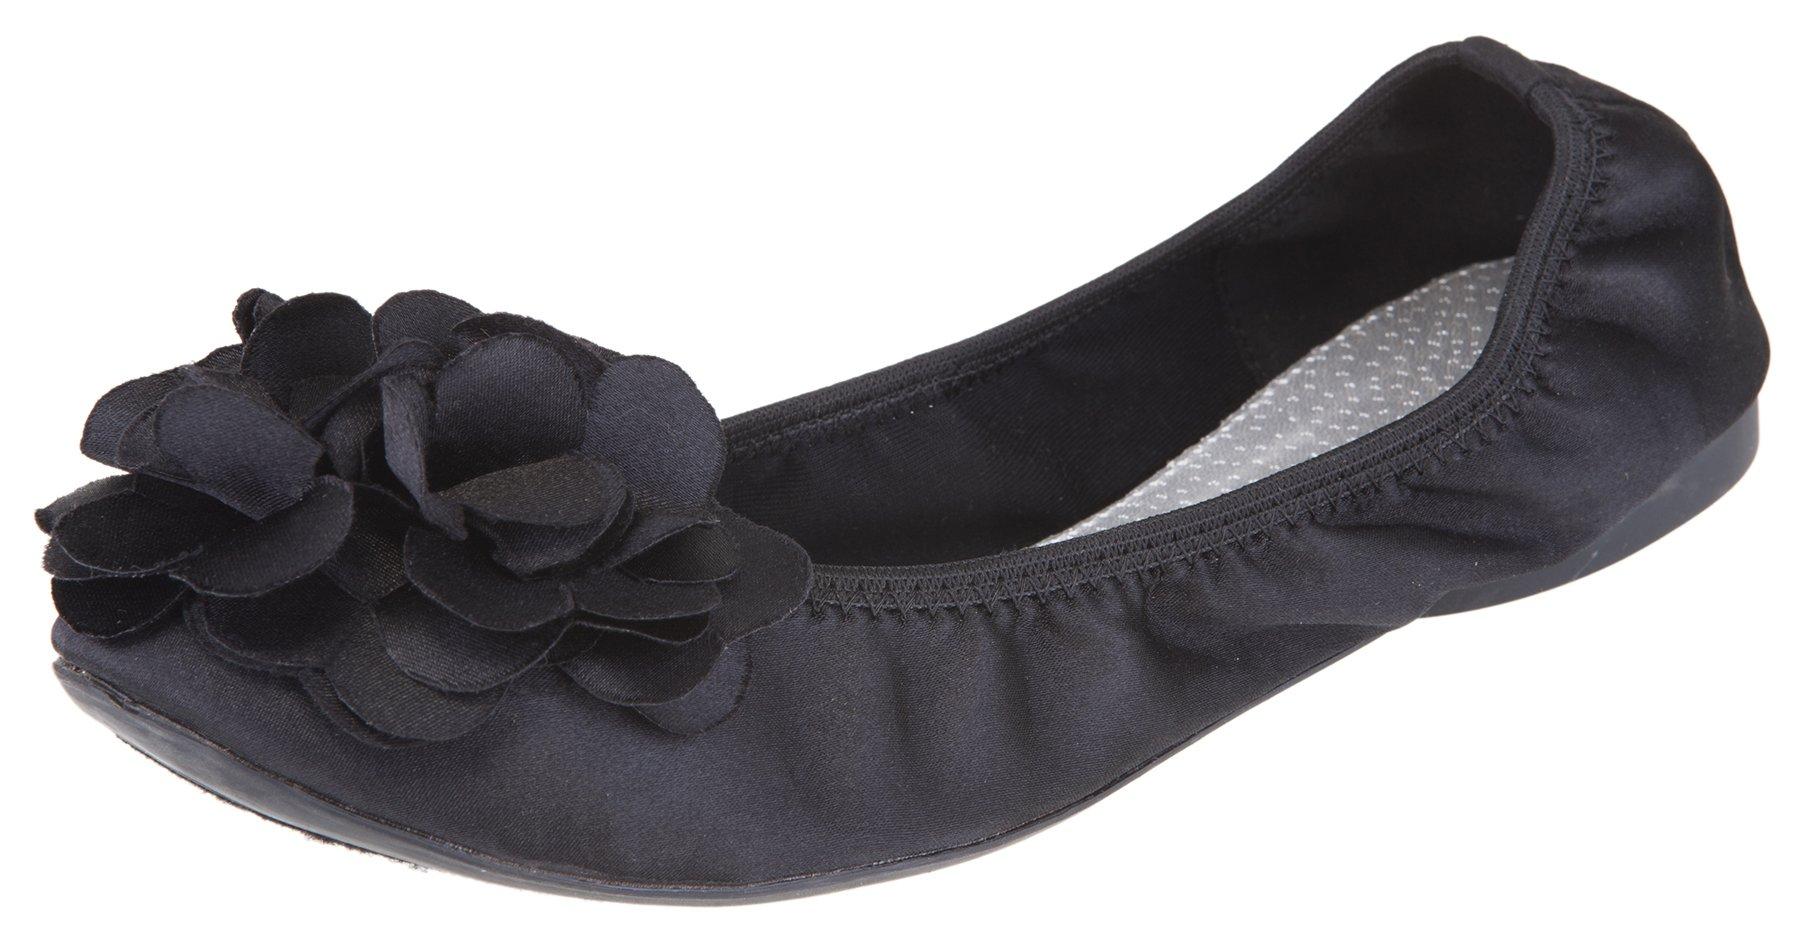 Outlandish Shoes Women's Poppy Ballet Flat (9 B(M) US, Black)